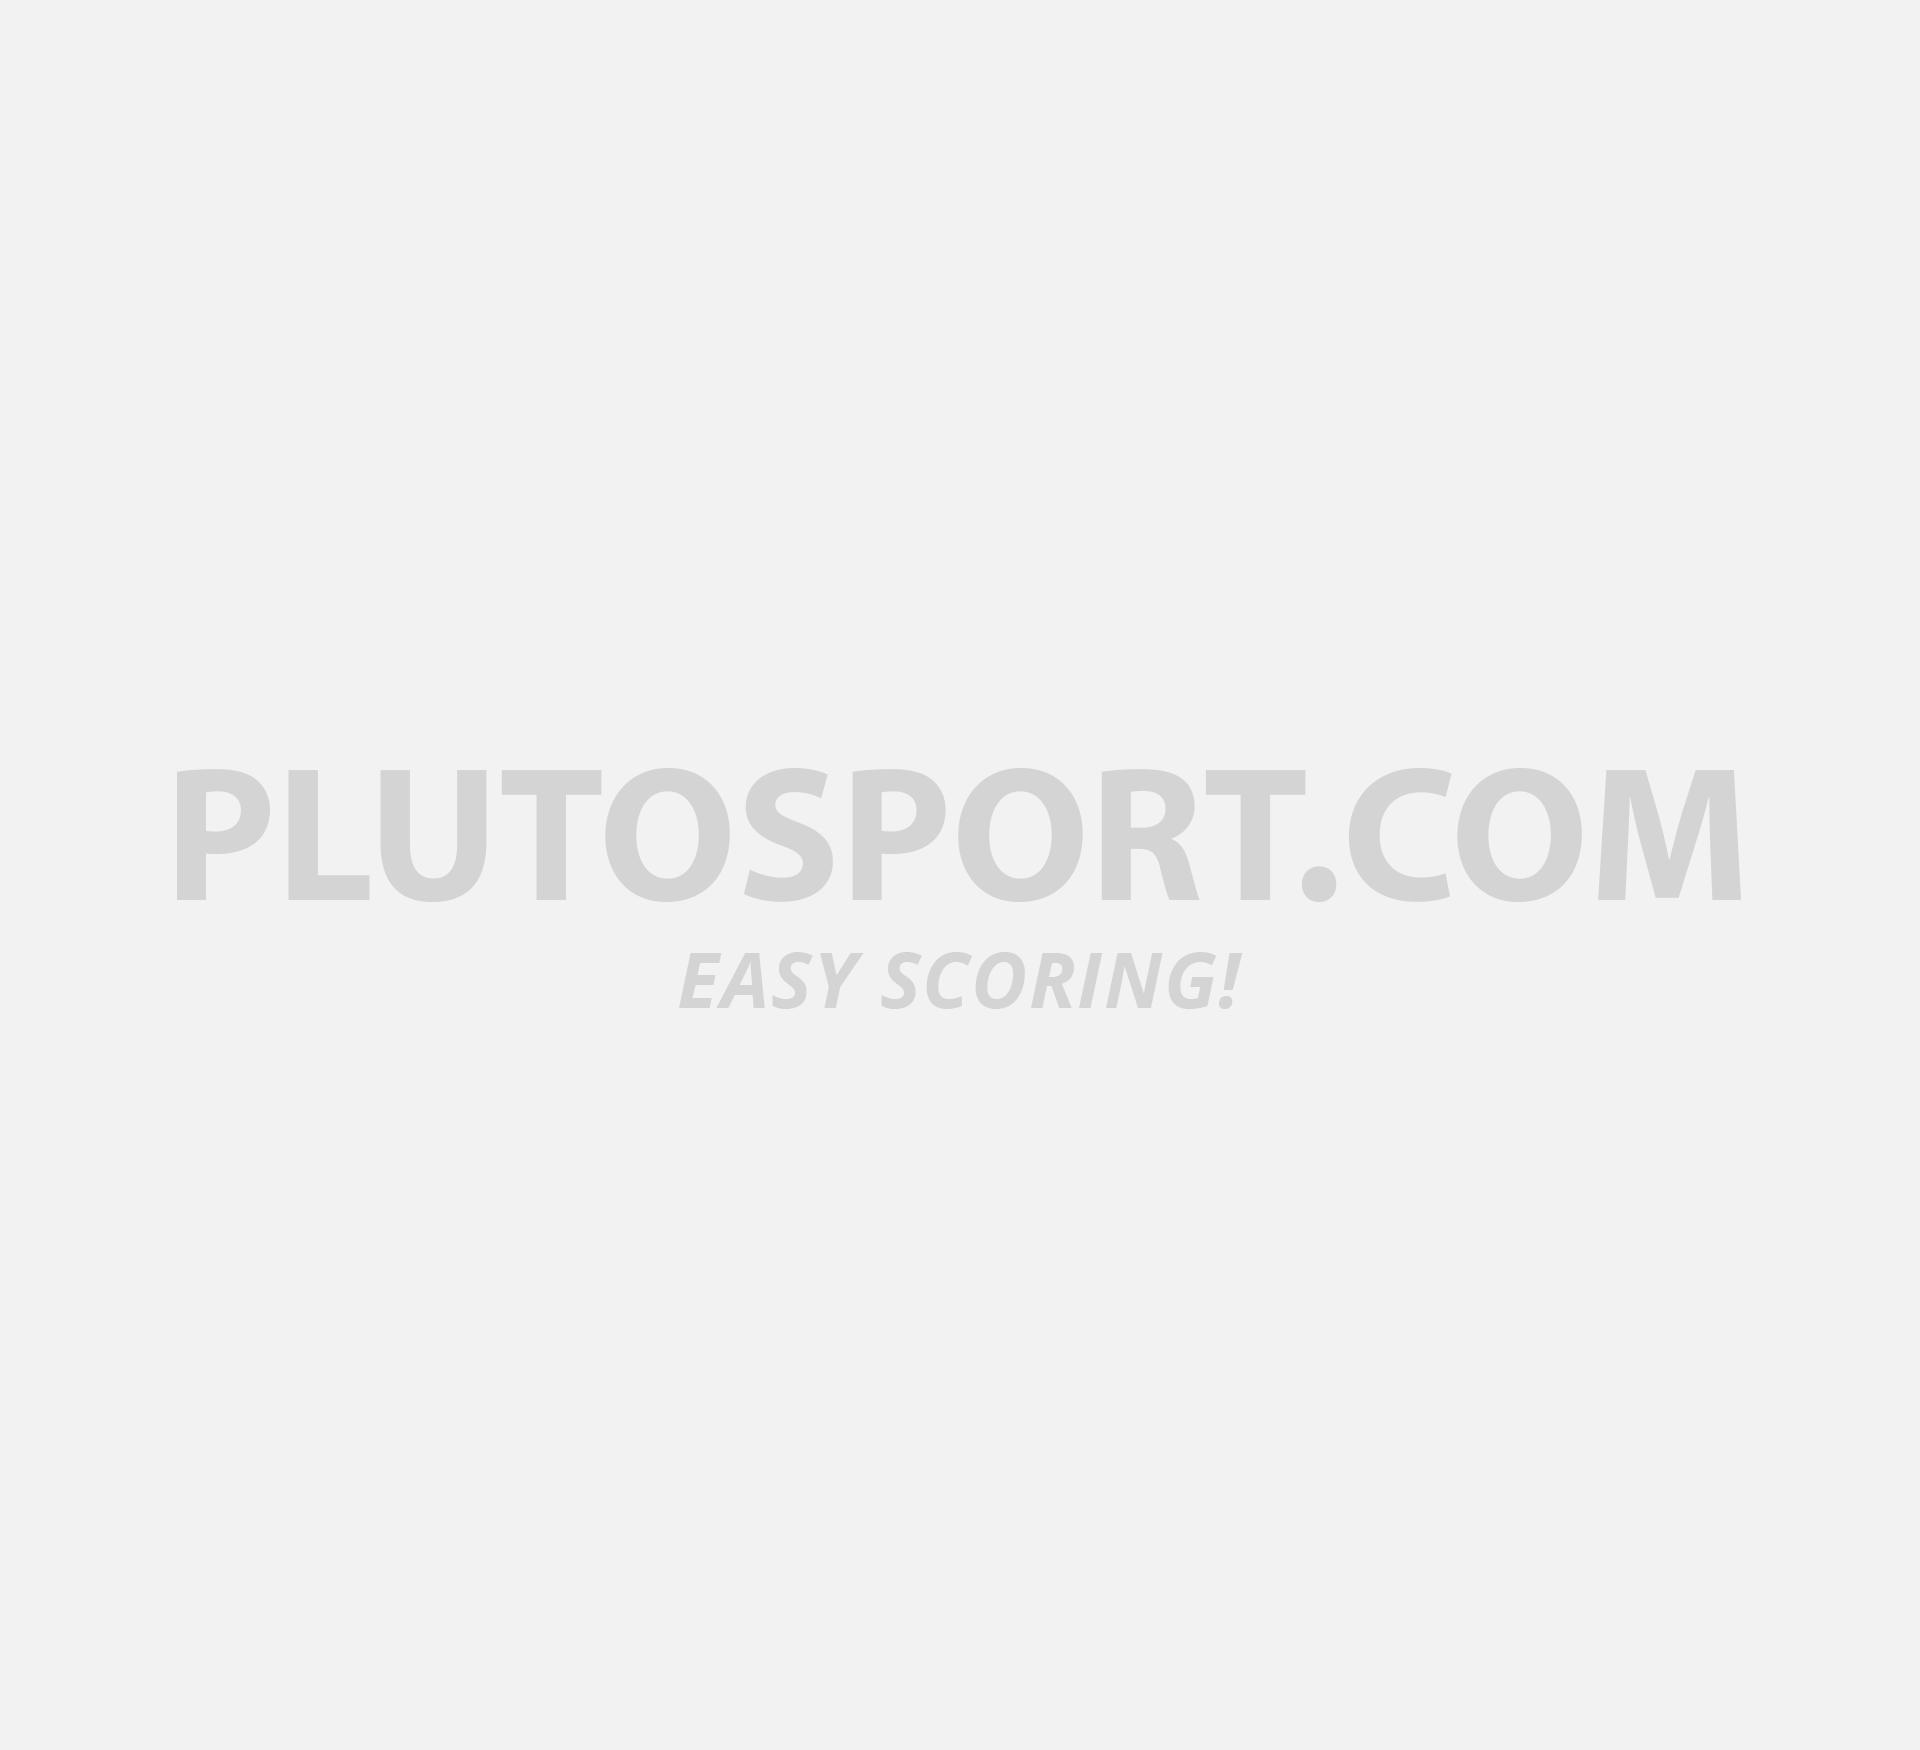 Adidas Match Light 3.0 Light Padelracket